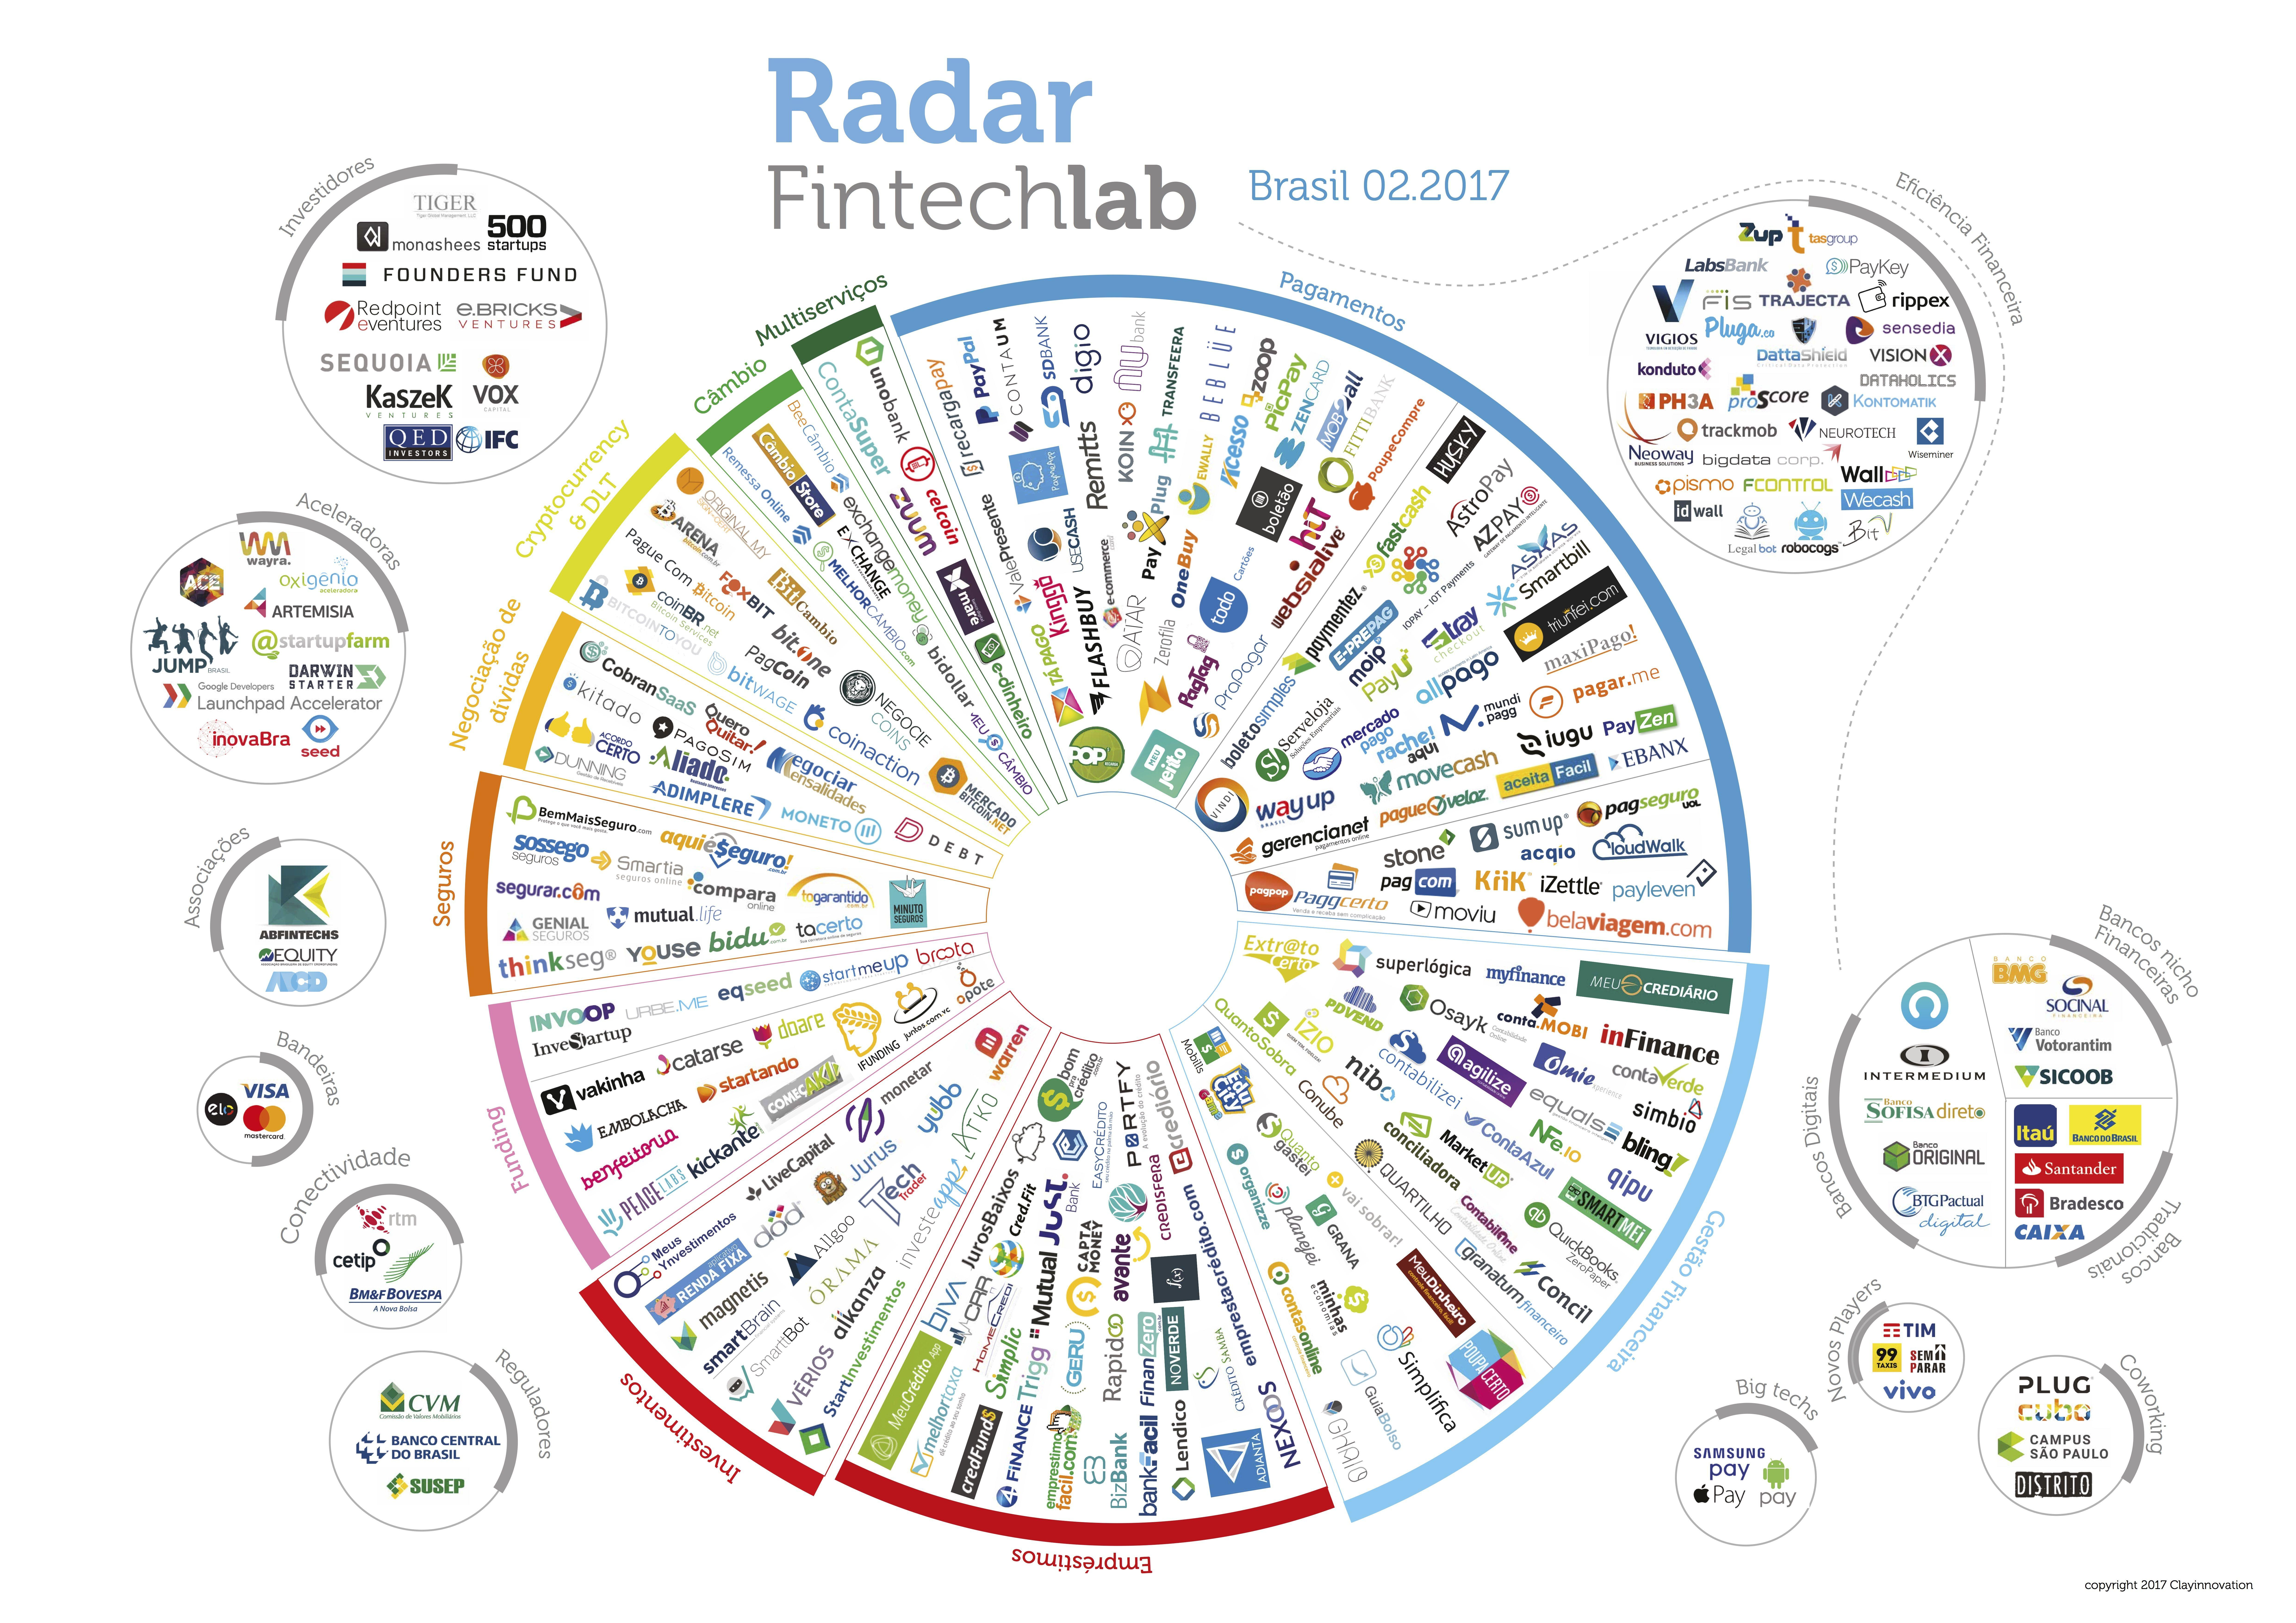 fintech #startup #radar #fintechlab #startups #finance #blockchain